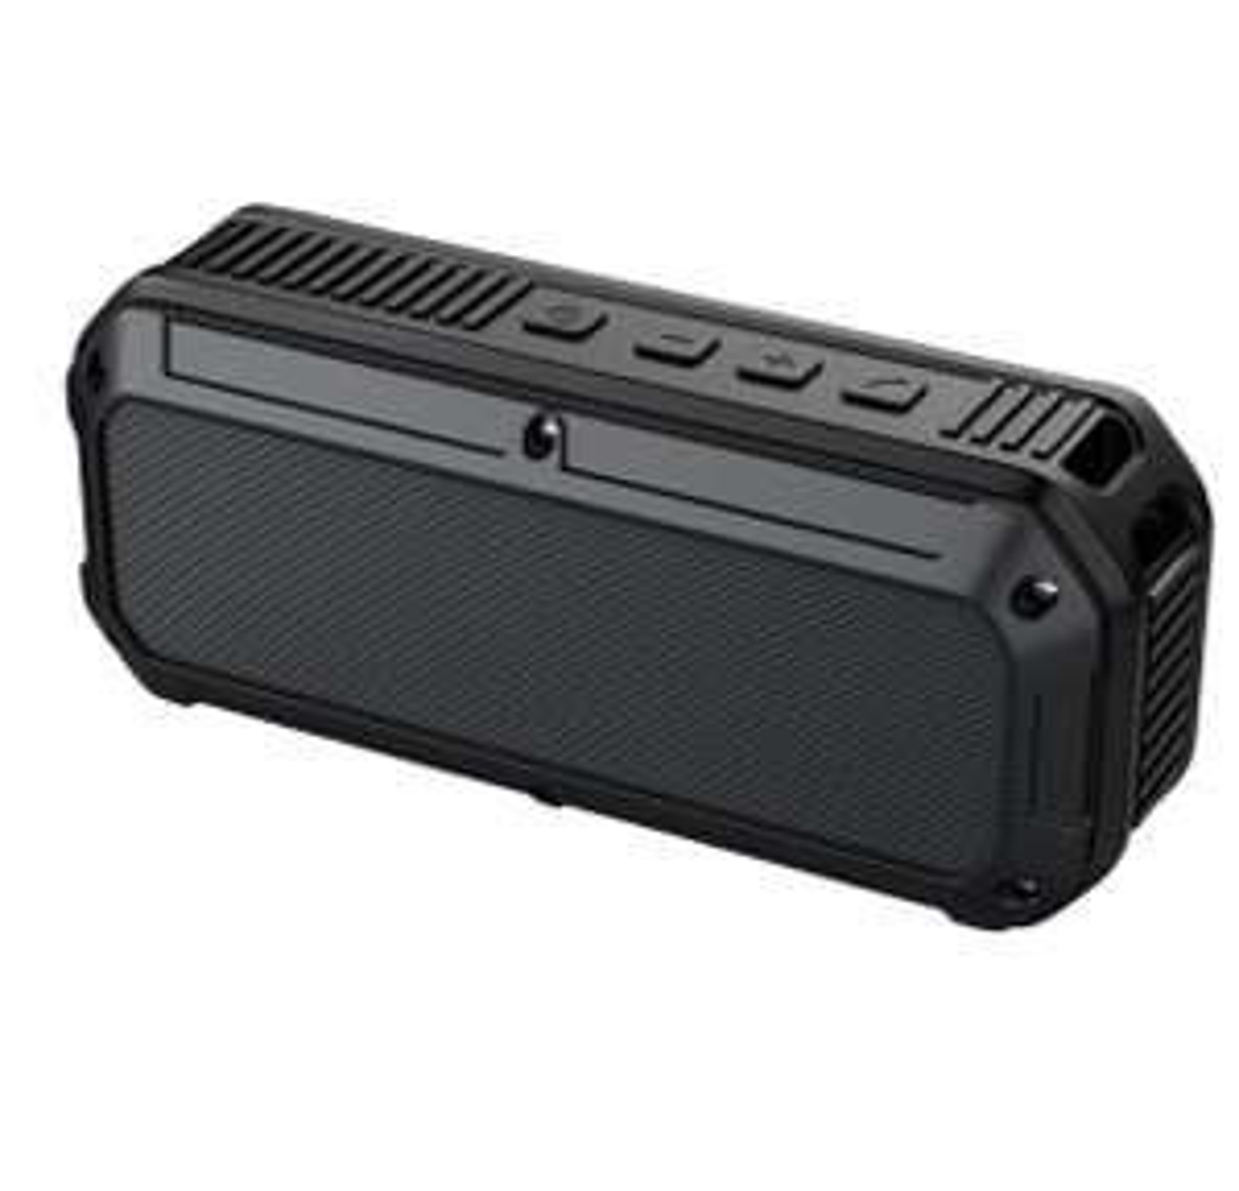 Enceinte Bluetooth Aukey SK-M8 - noir (vendeur tiers)